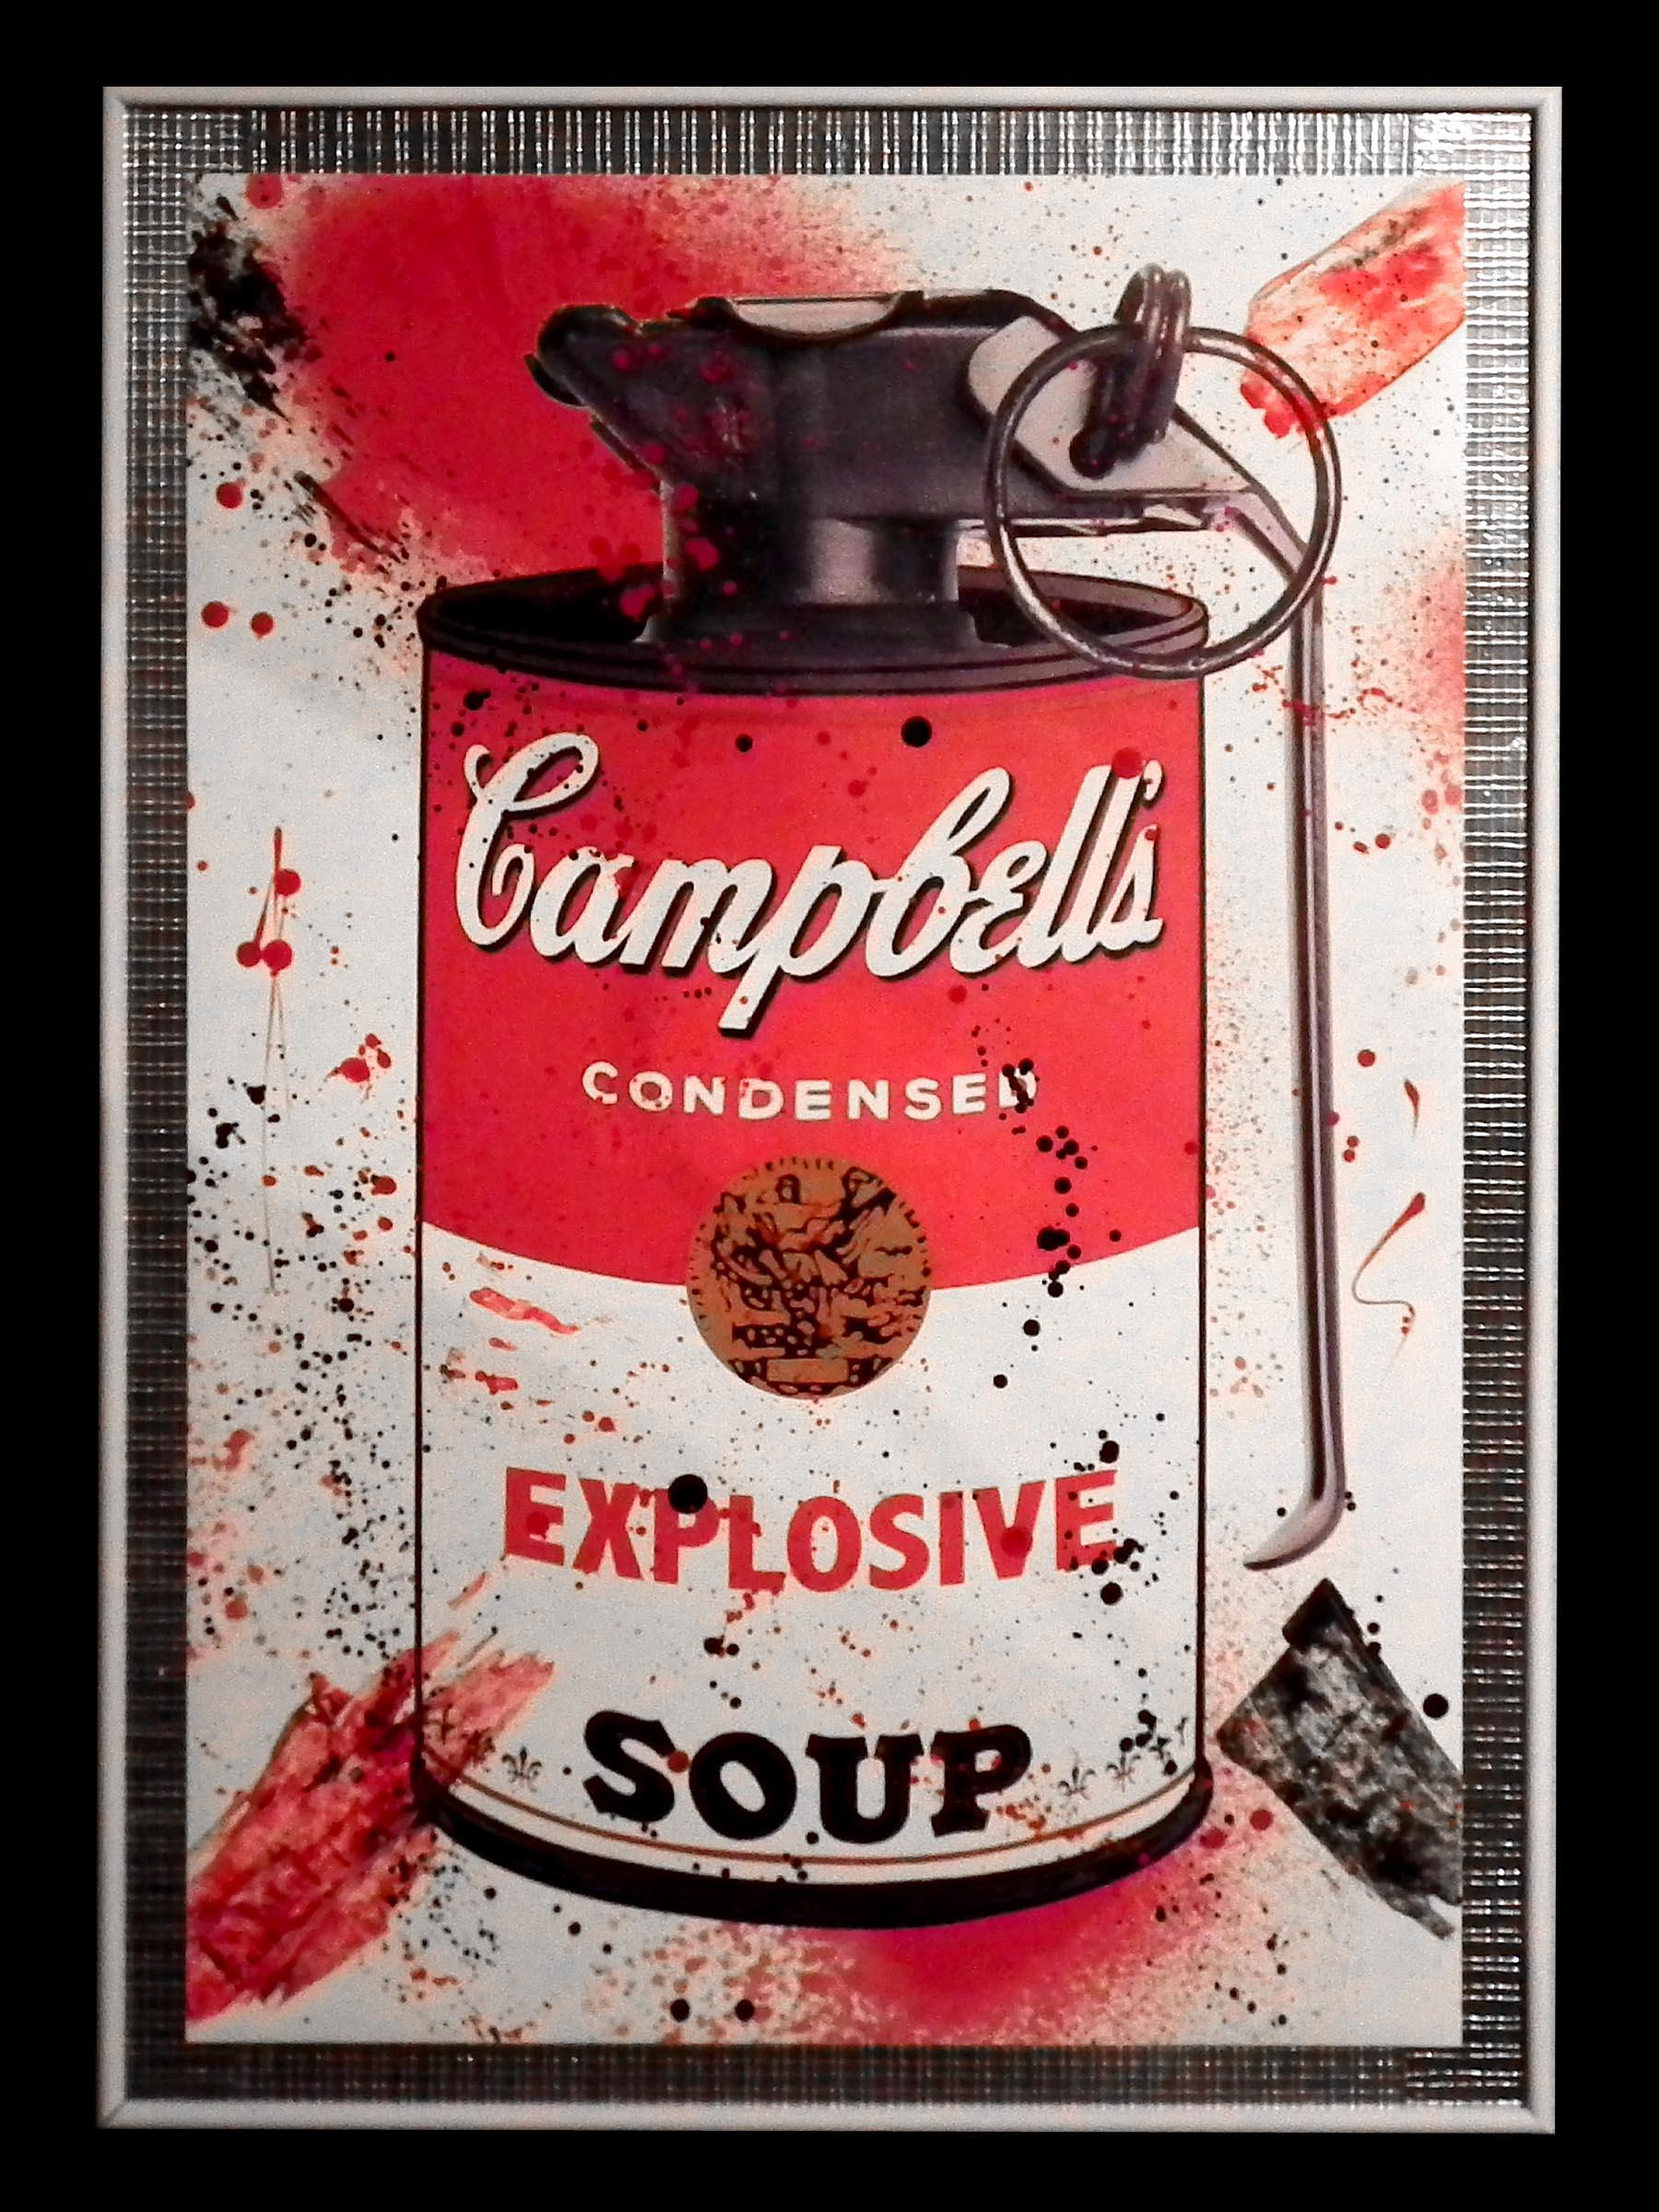 Explosive rouge